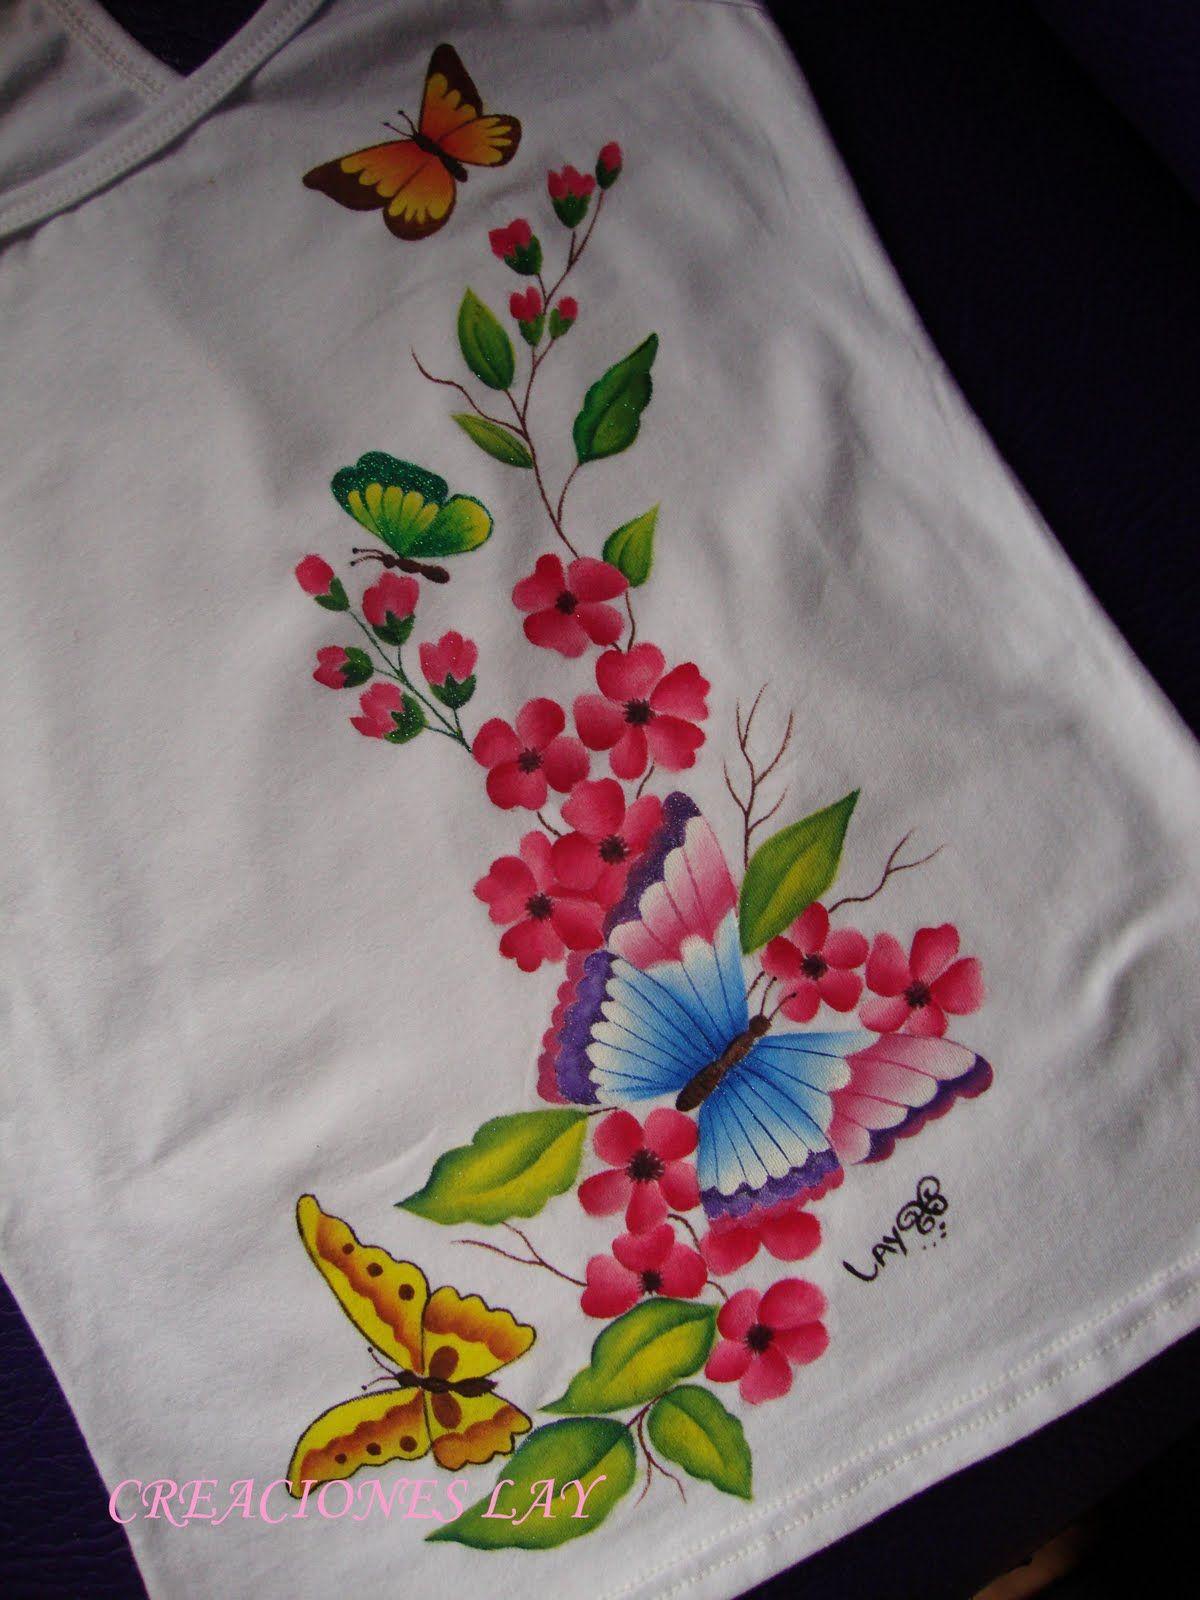 Creaciones lay mariposas y flores pintar blusa pinterest pintura en tela pintar en tela - Como pintar sobre tela ...